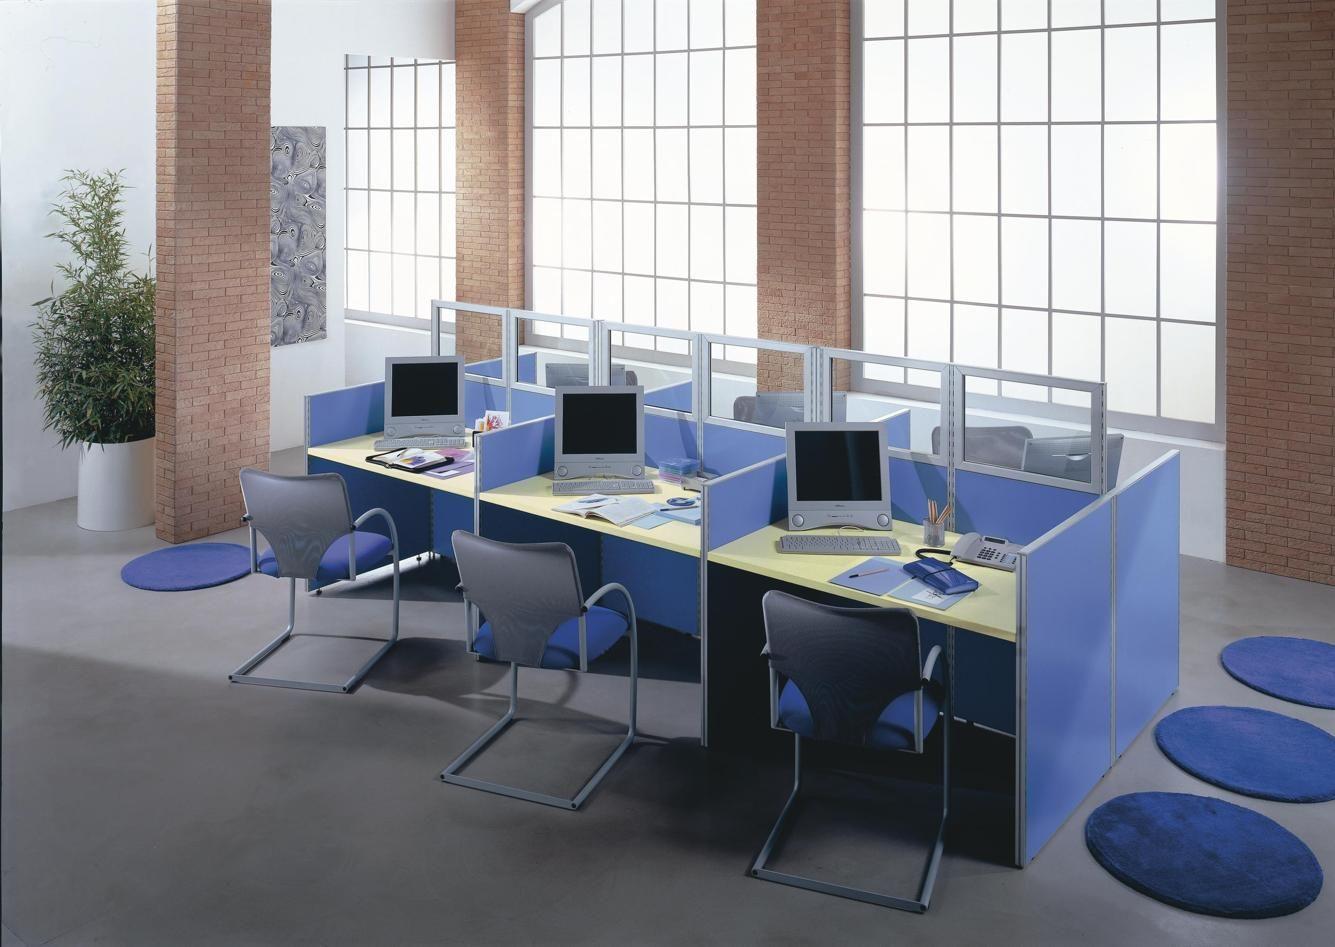 Workstation office furniture - Office Desk EIDOS 44-44 ...   eidos furniture